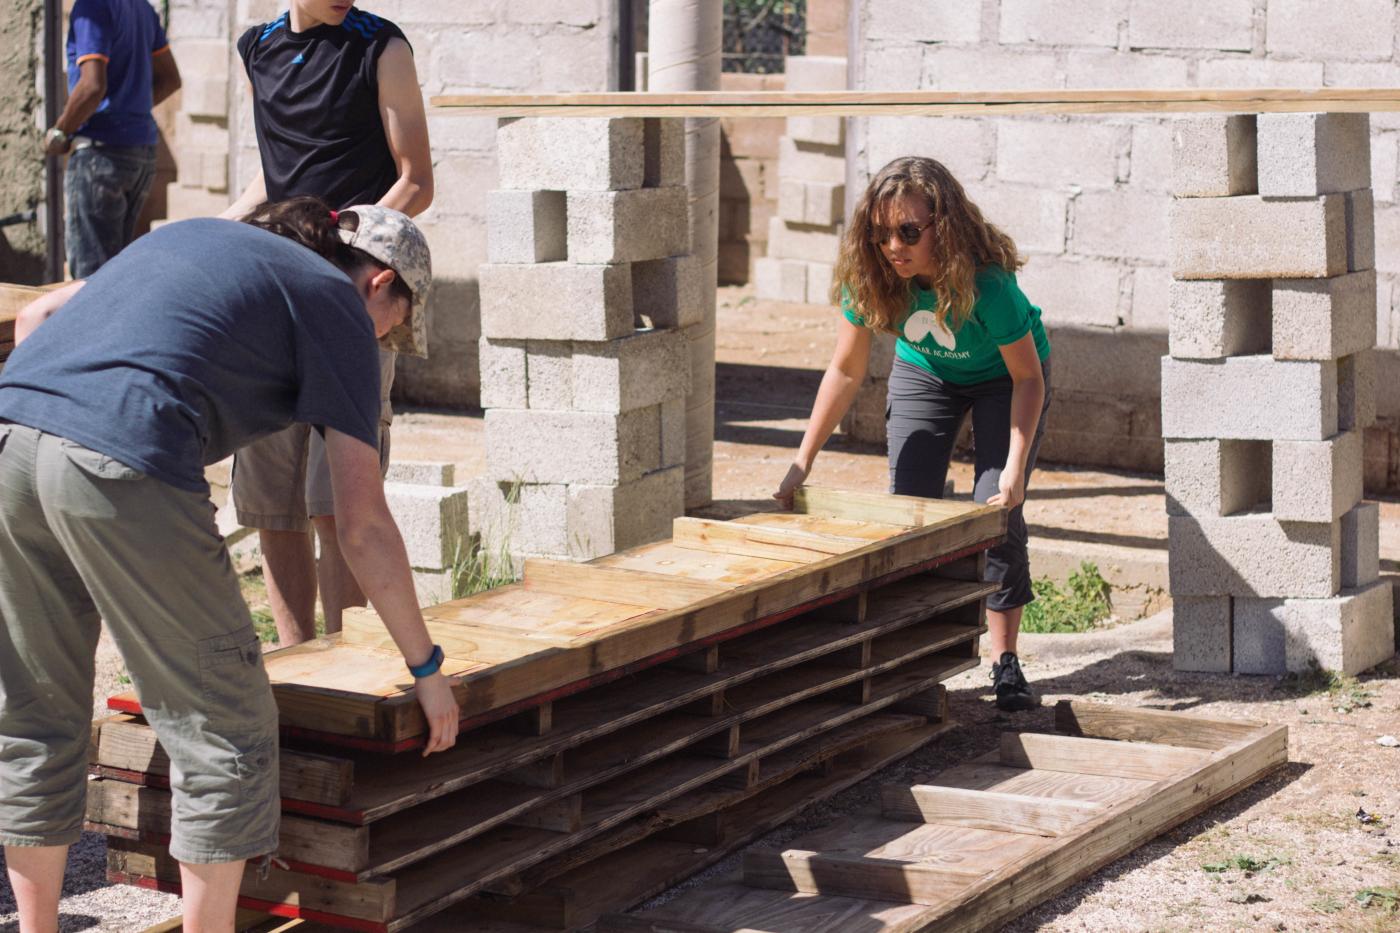 Rebekah and Mackenzie working together.